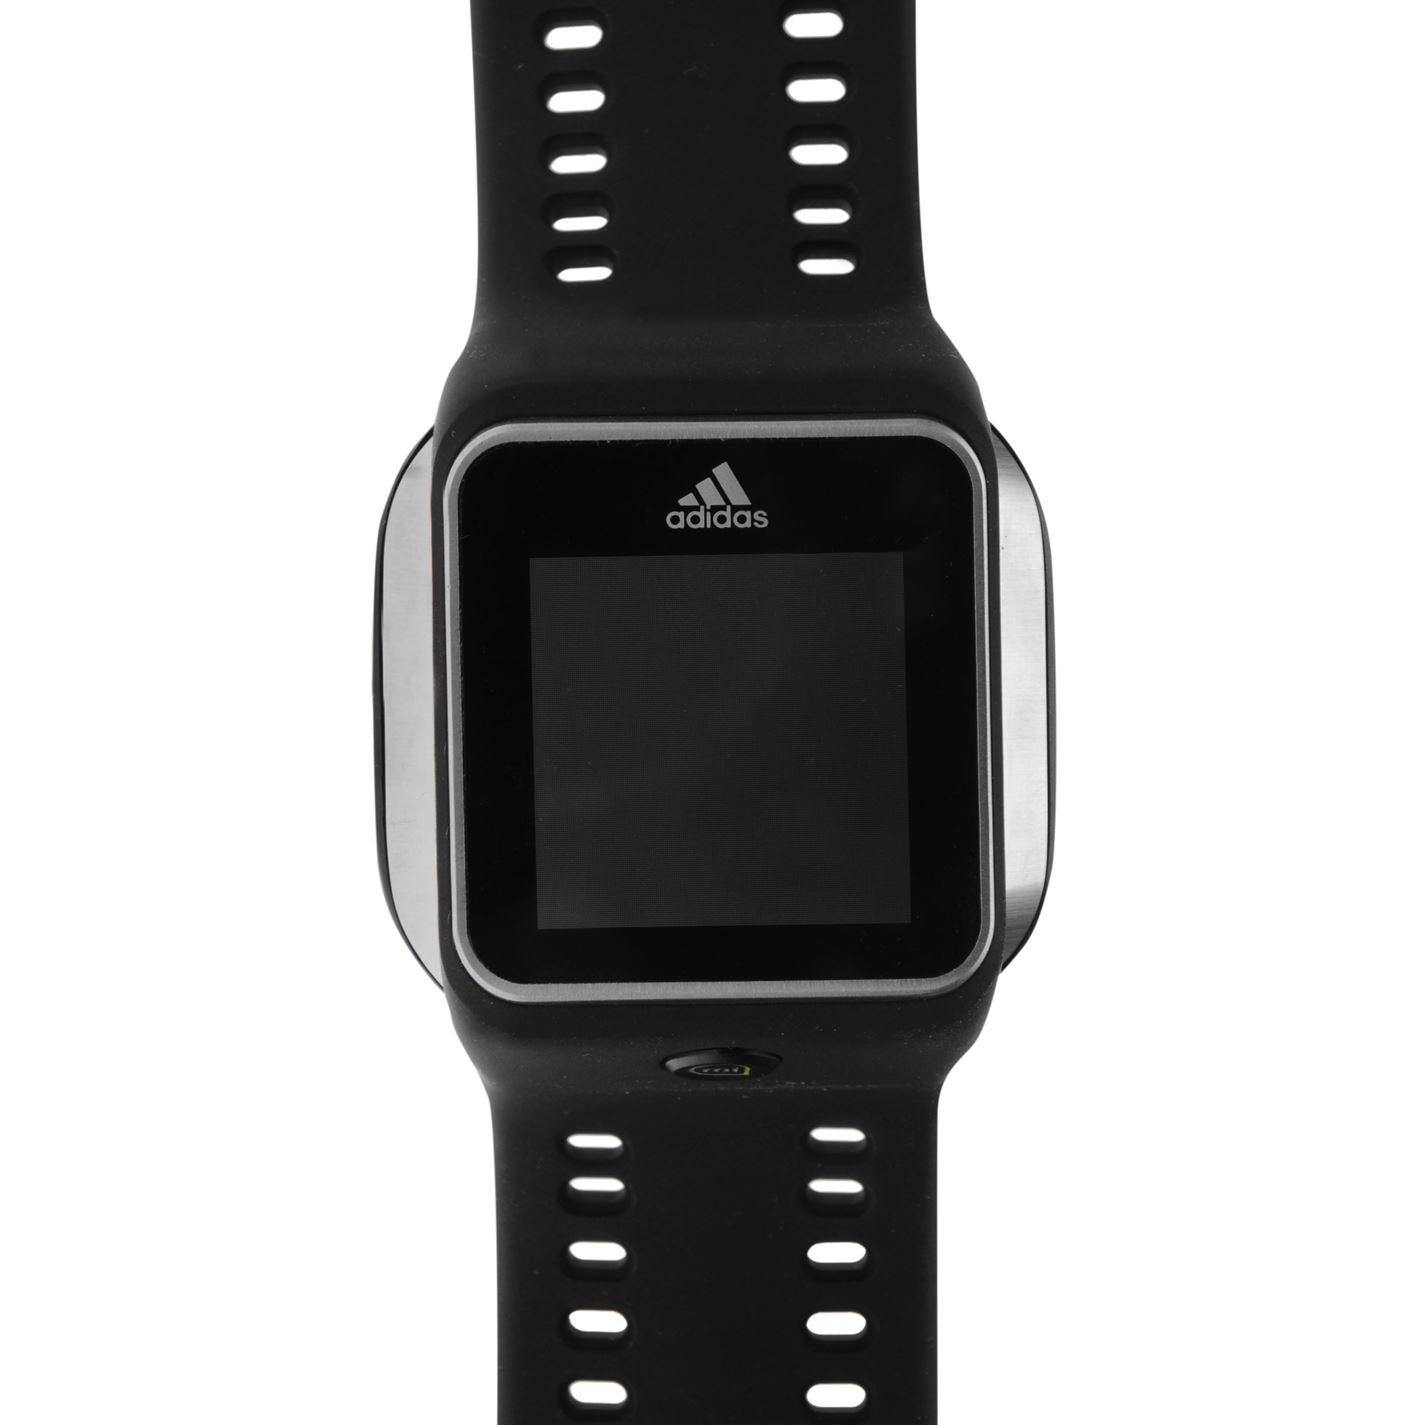 Adidas Smart Run Watch